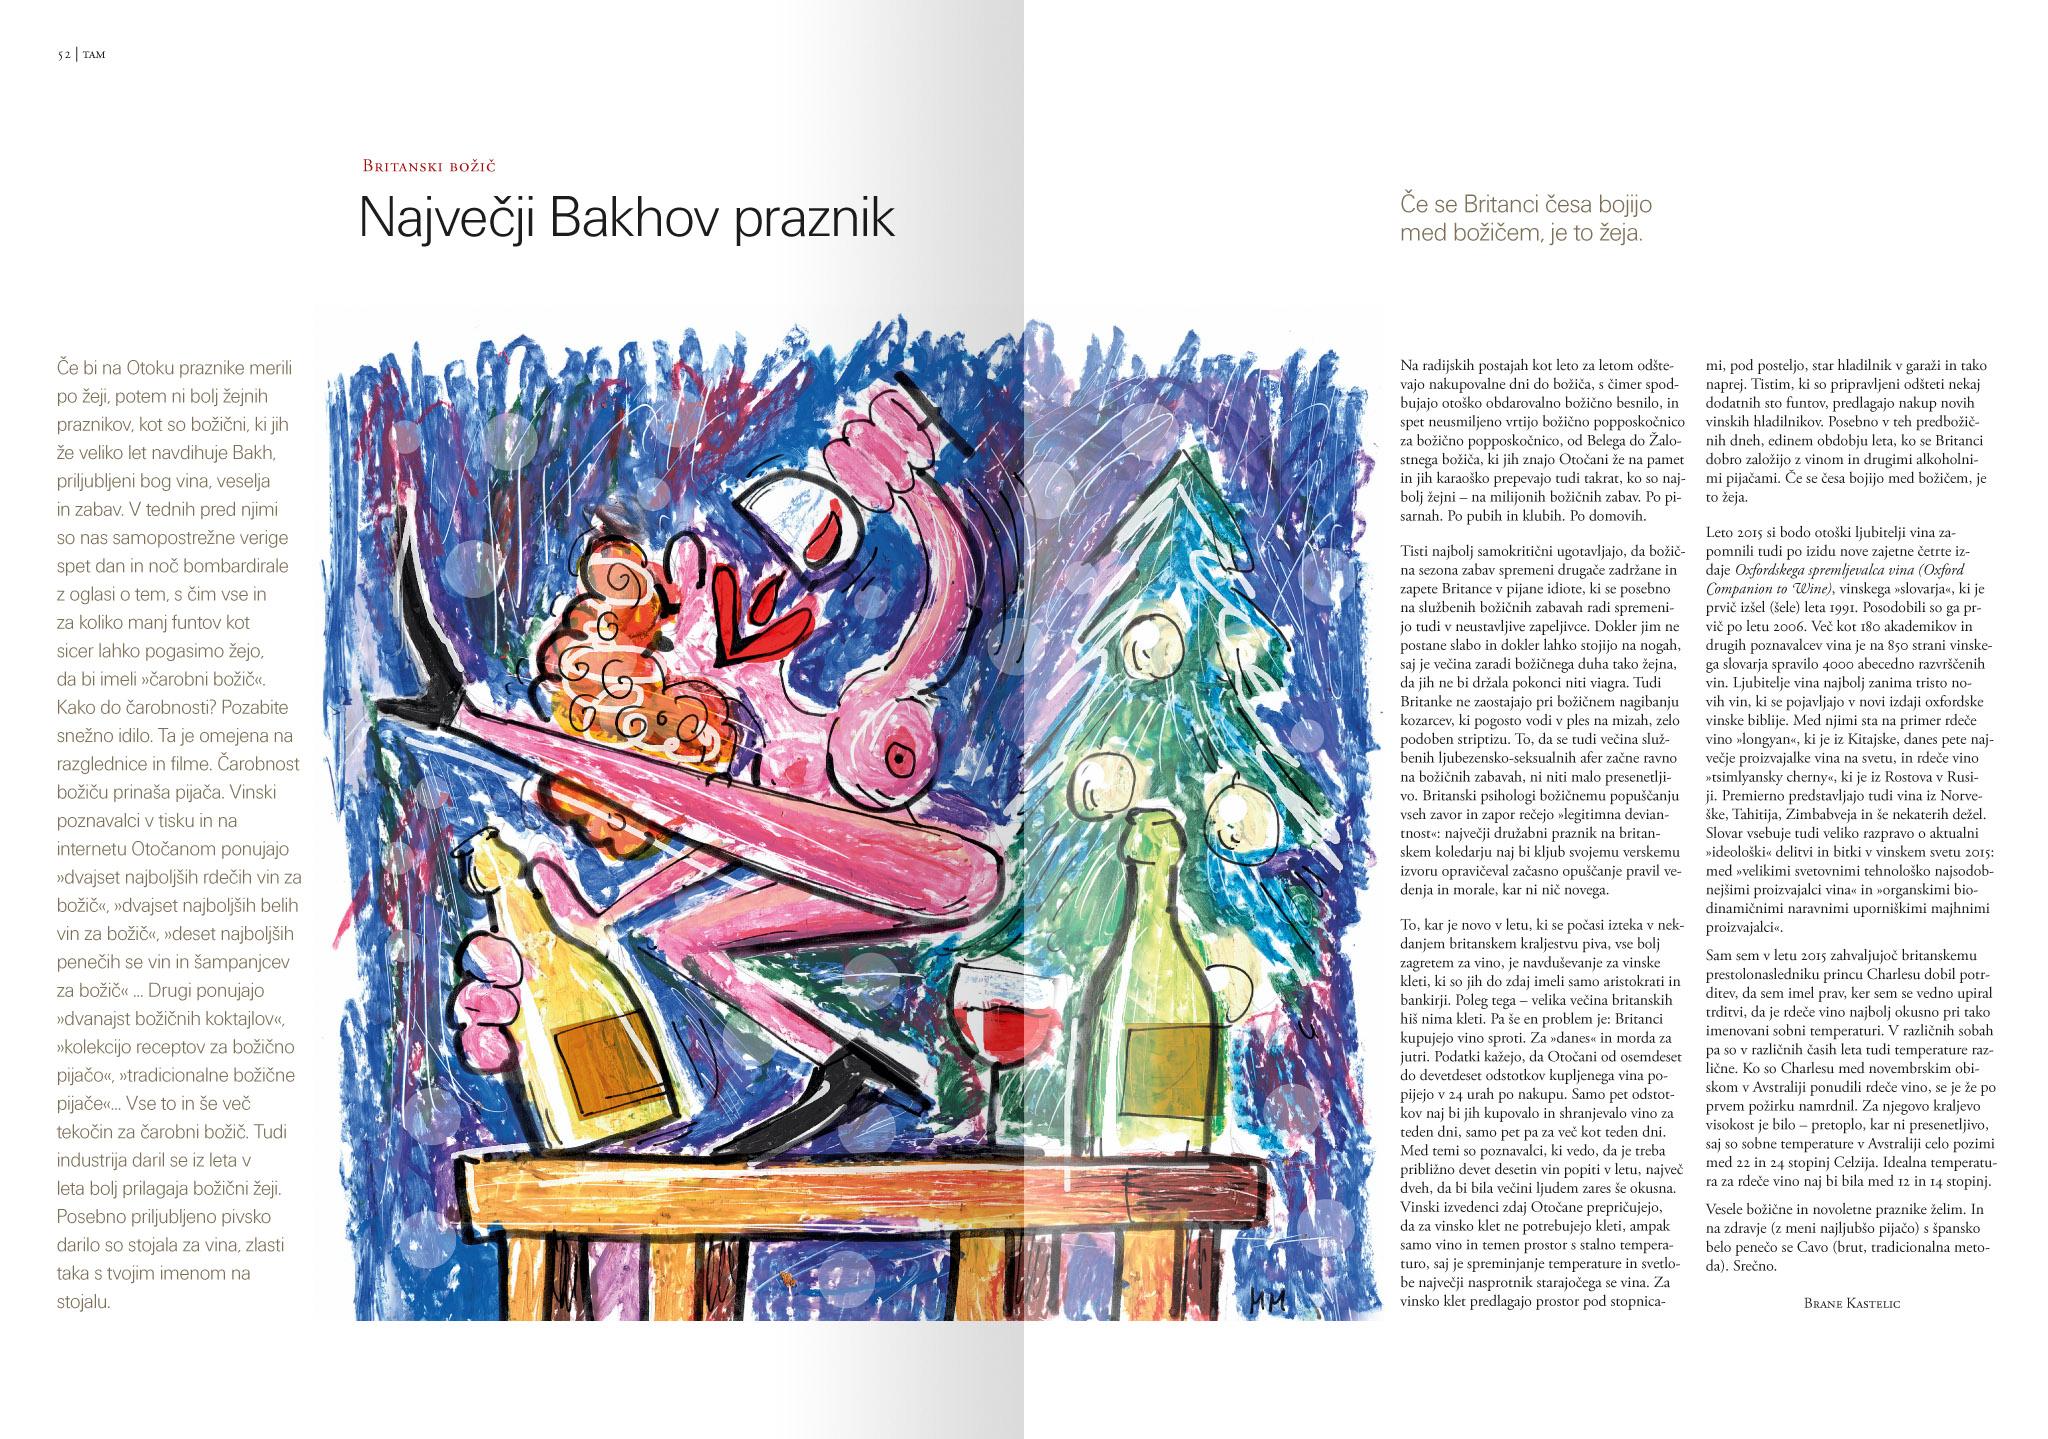 Revija Vino, zima 2015, strani 52 in 53. Ilustracija za članek. · Naročnik: Revija Vino · Ilustracija: Marijan Močivnik · 2015 ·